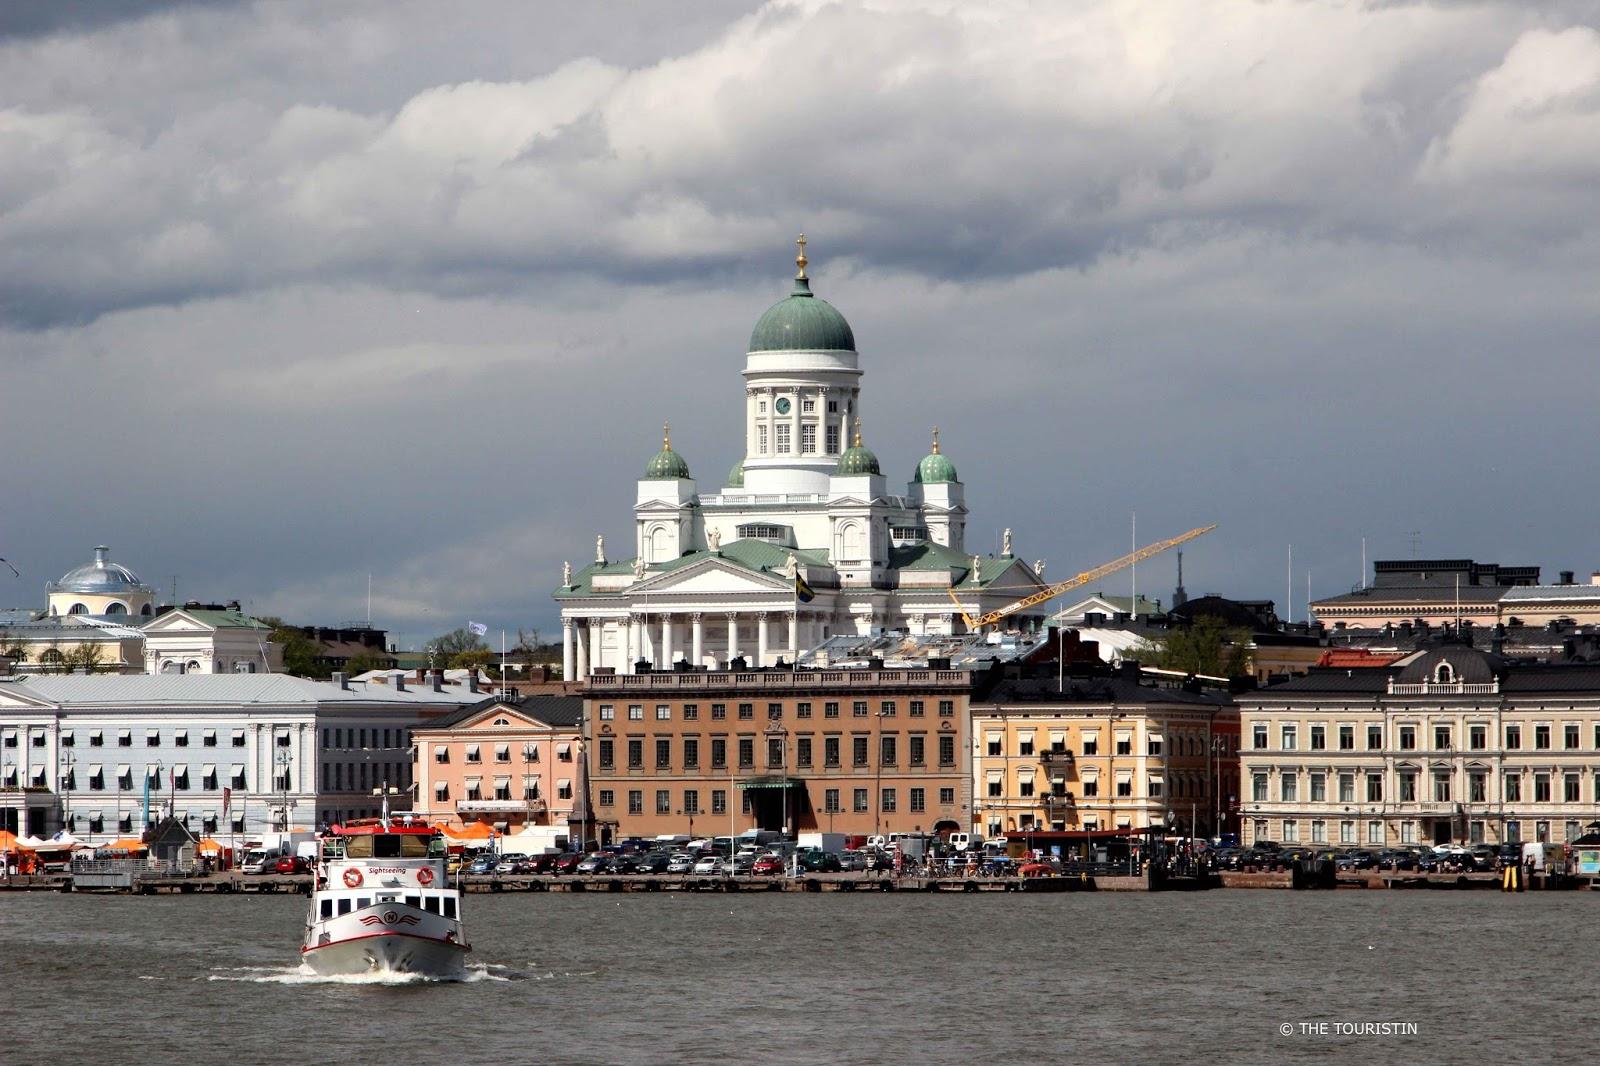 THE TOURISTIN: Helsinki-Guide. Do You Love Design, Books, Food and Equality?